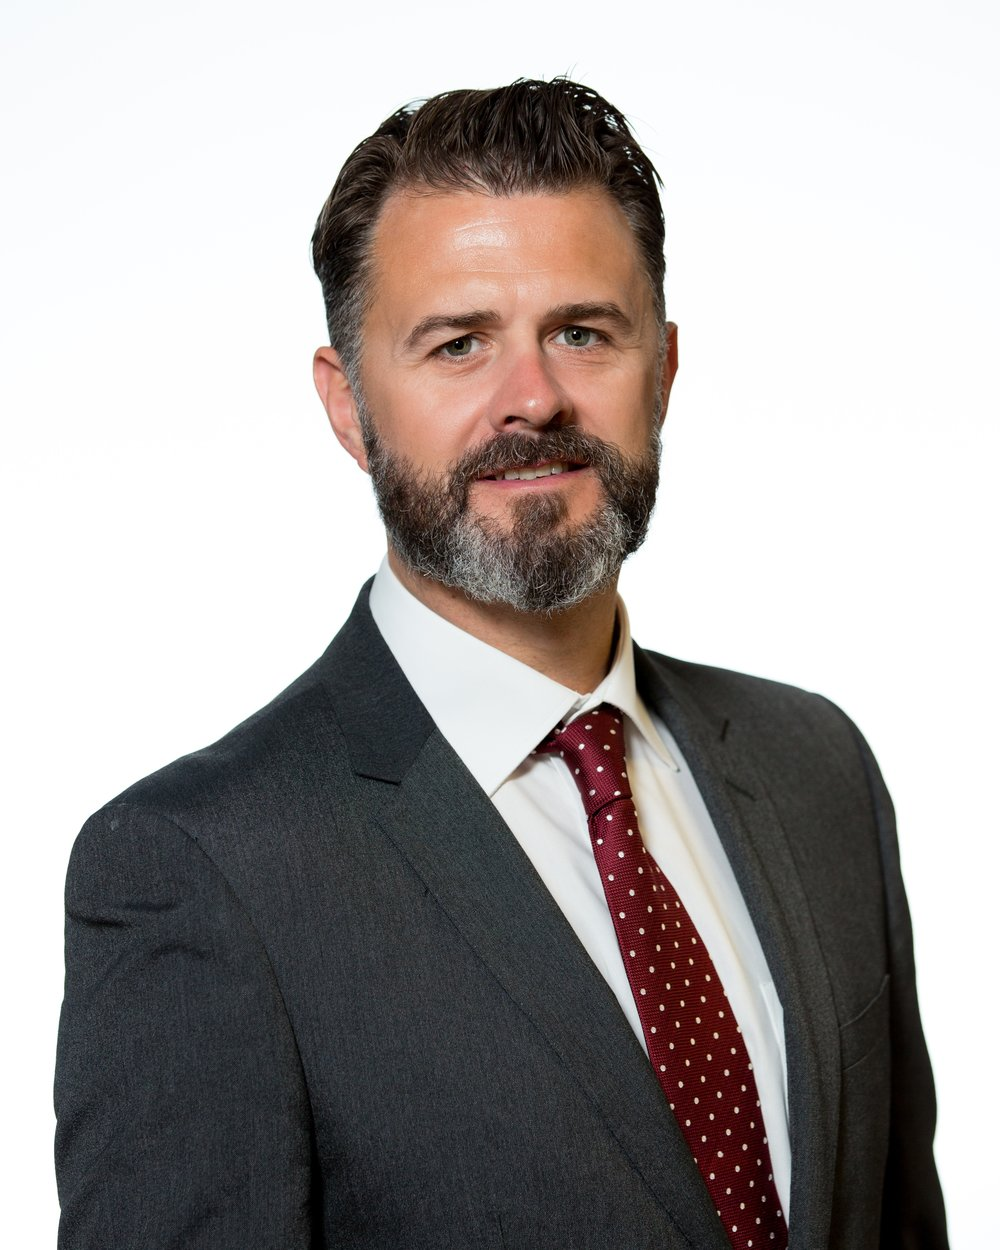 owen sullivan    director - chief of drafting    owen.sullivan@csconsulting.ie